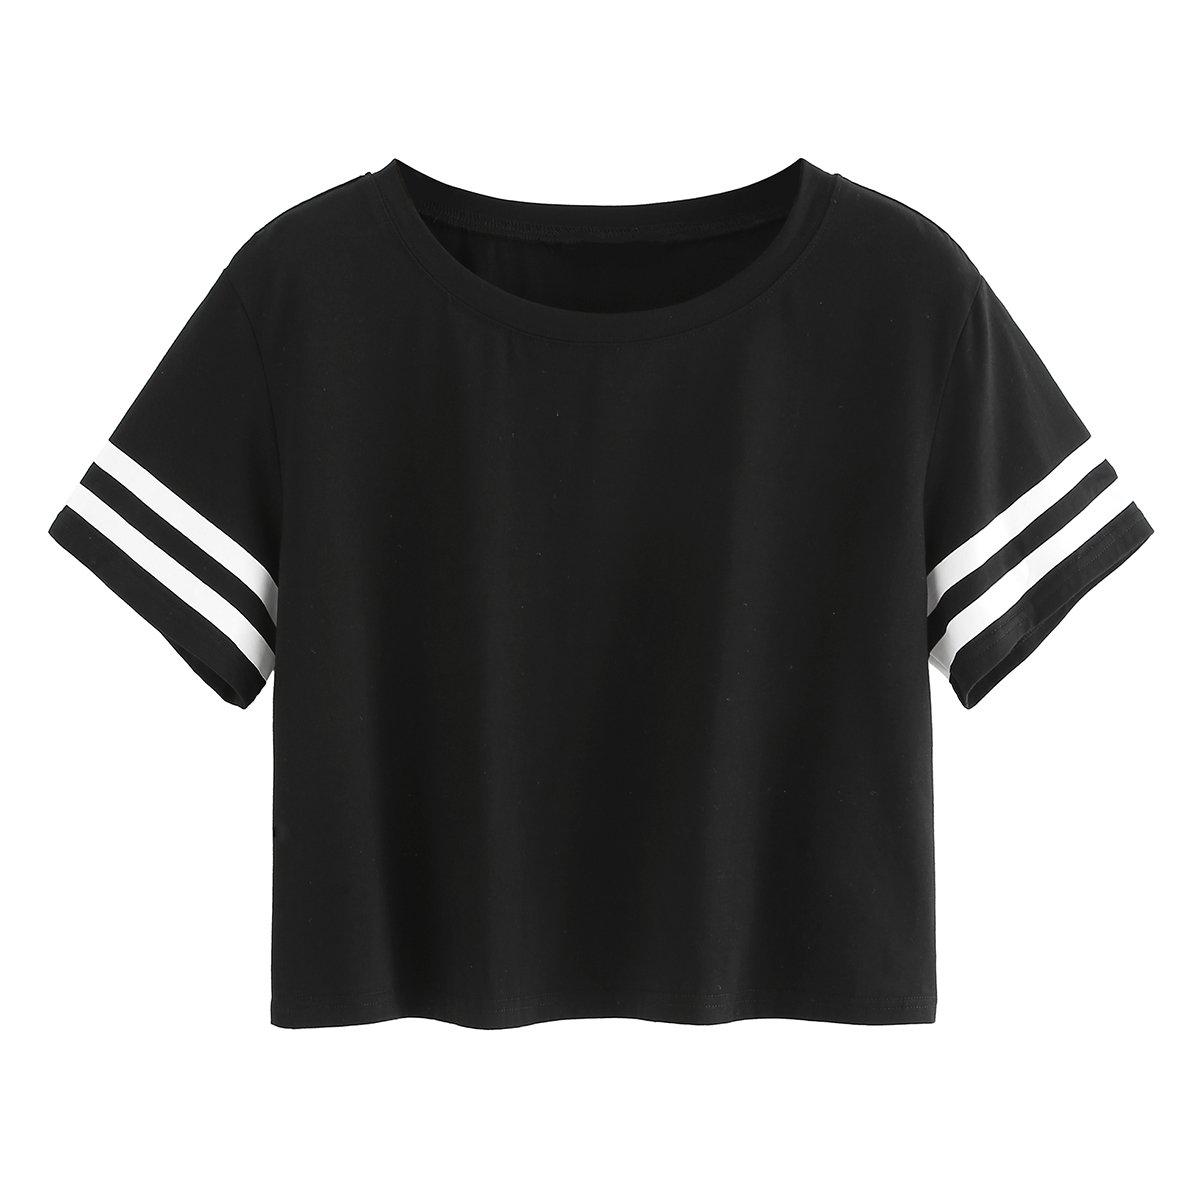 SweatyRocks Women's Striped Short Sleeve Crewneck Crop Top Tshirt Black #1 XS